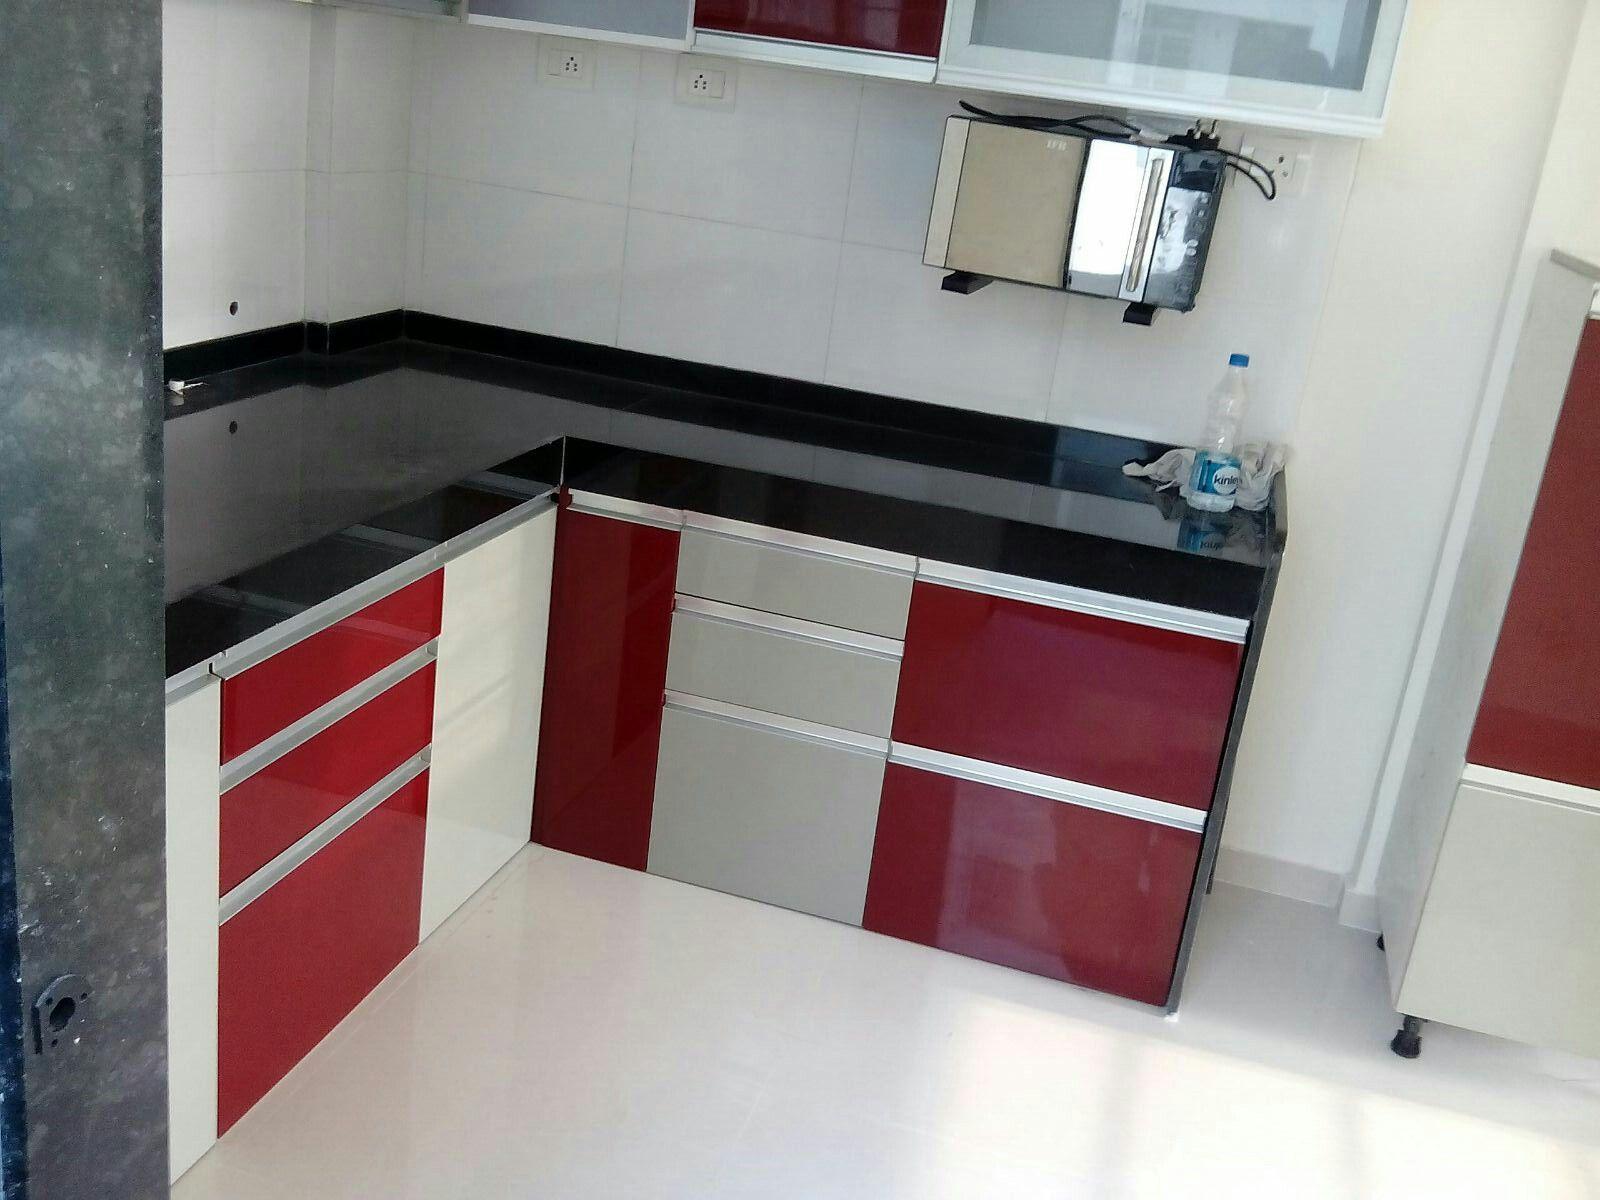 5 Reasons Why Modular Kitchen Designs Are The Latest Trend In Home Decor Kitchen Furniture Design Kitchen Sink Decor Kitchen Models